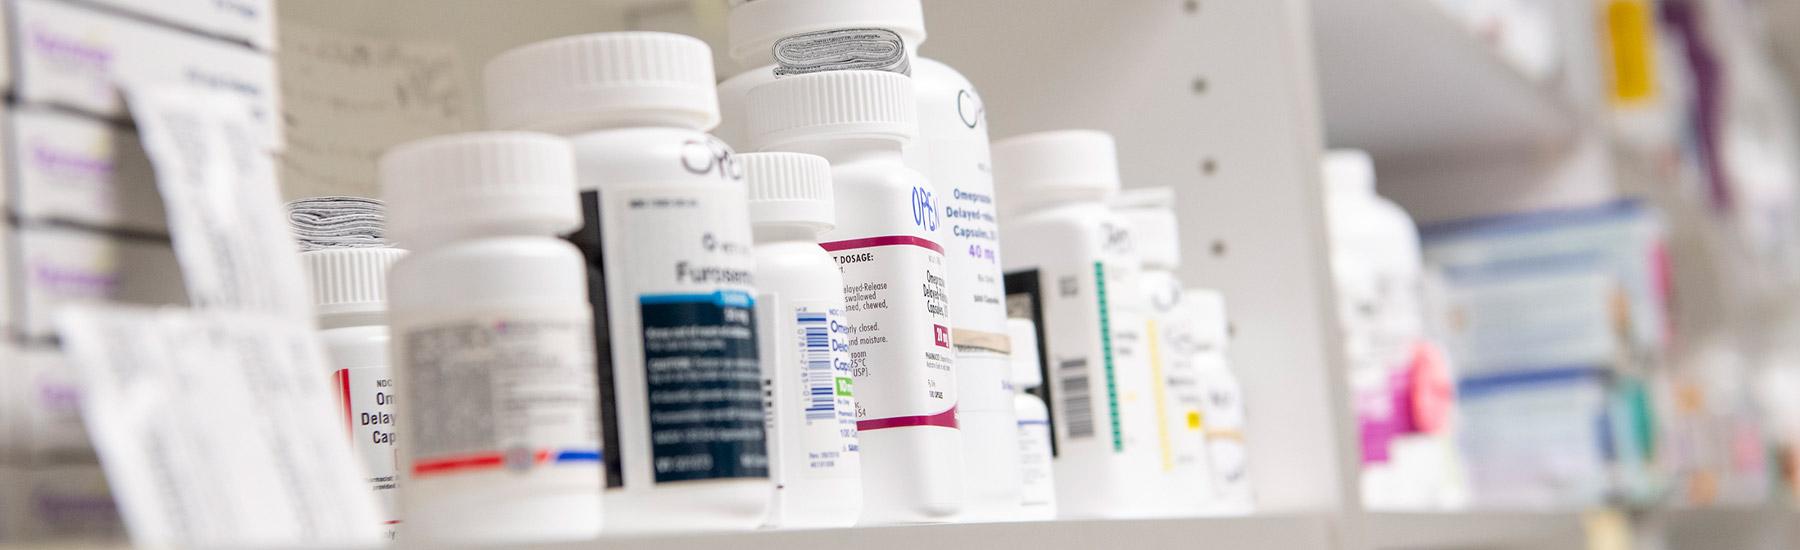 pharmacy pet prescription medications